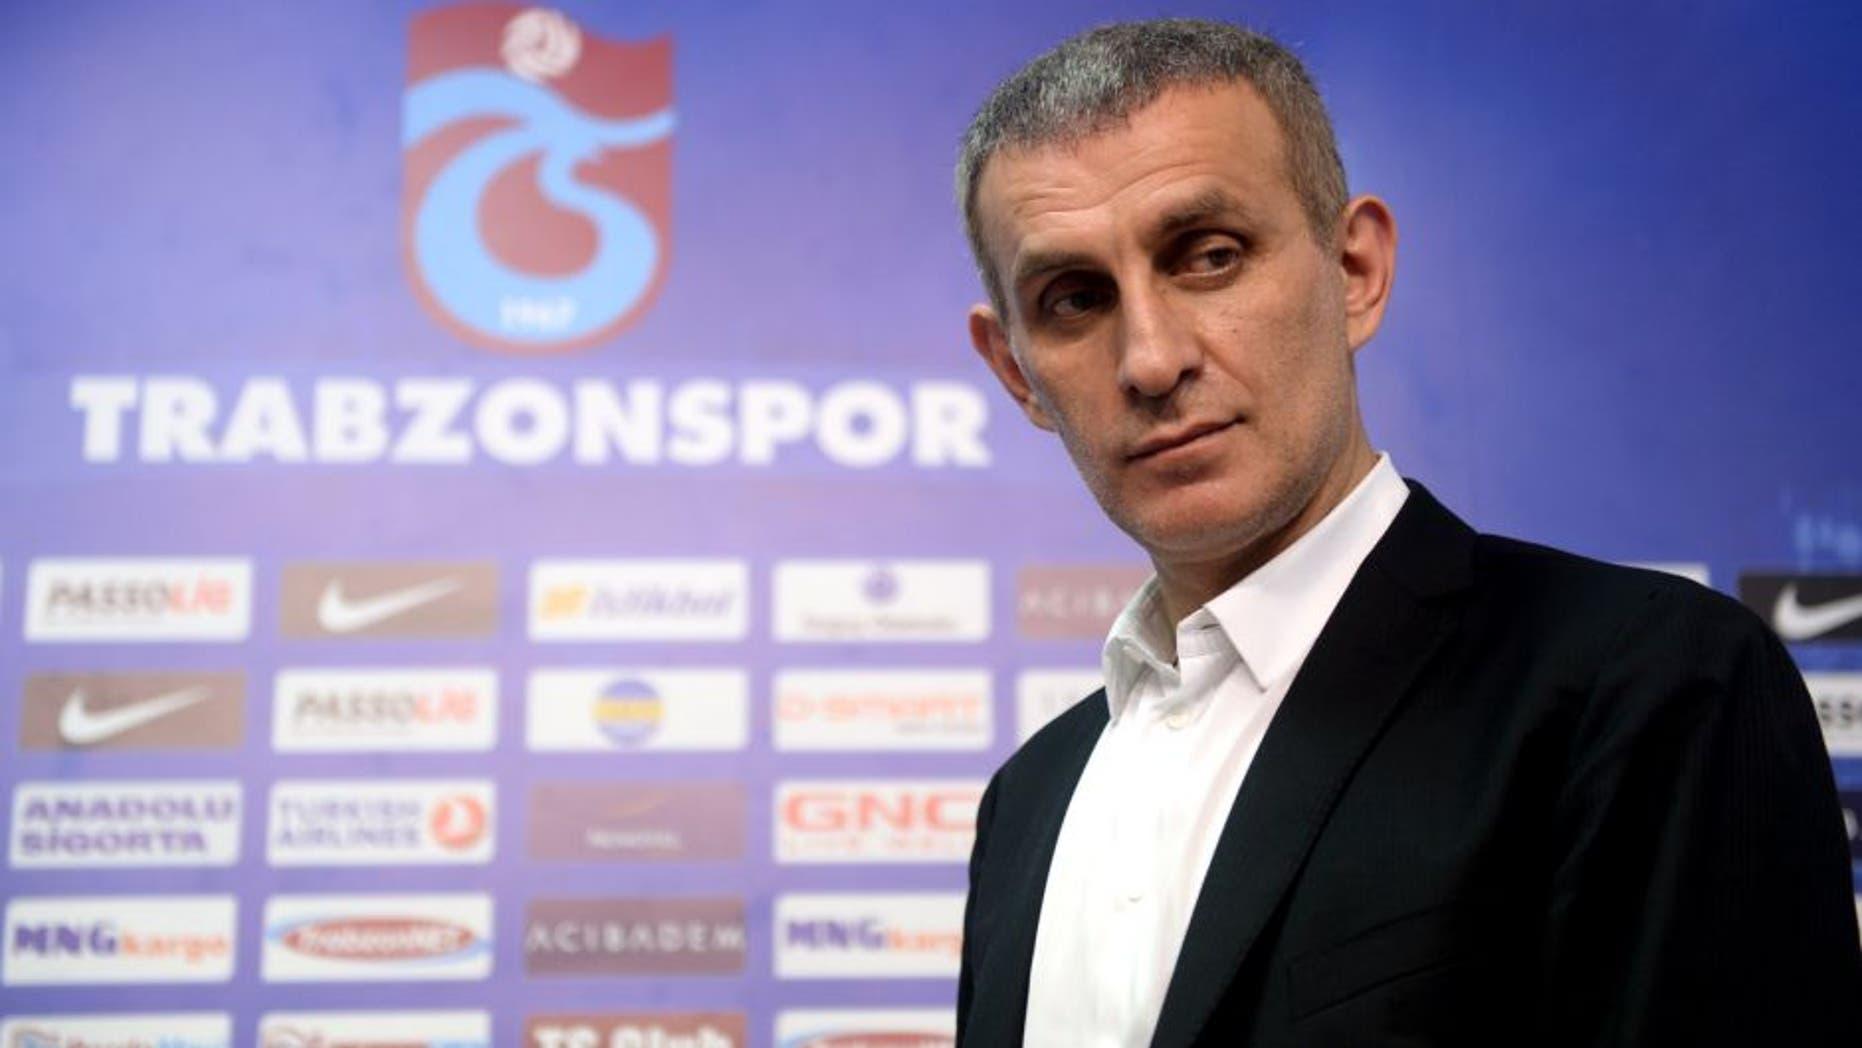 TRABZON, TURKEY - JULY 15: Head of Trabzonspor Ibrahim Haciosmanoglu (on the photo) joins signing ceremony in Trabzon, Turkey on 15 July, 2014. (Photo by Hakan Burak Altunoz/Anadolu Agency/Getty Images)